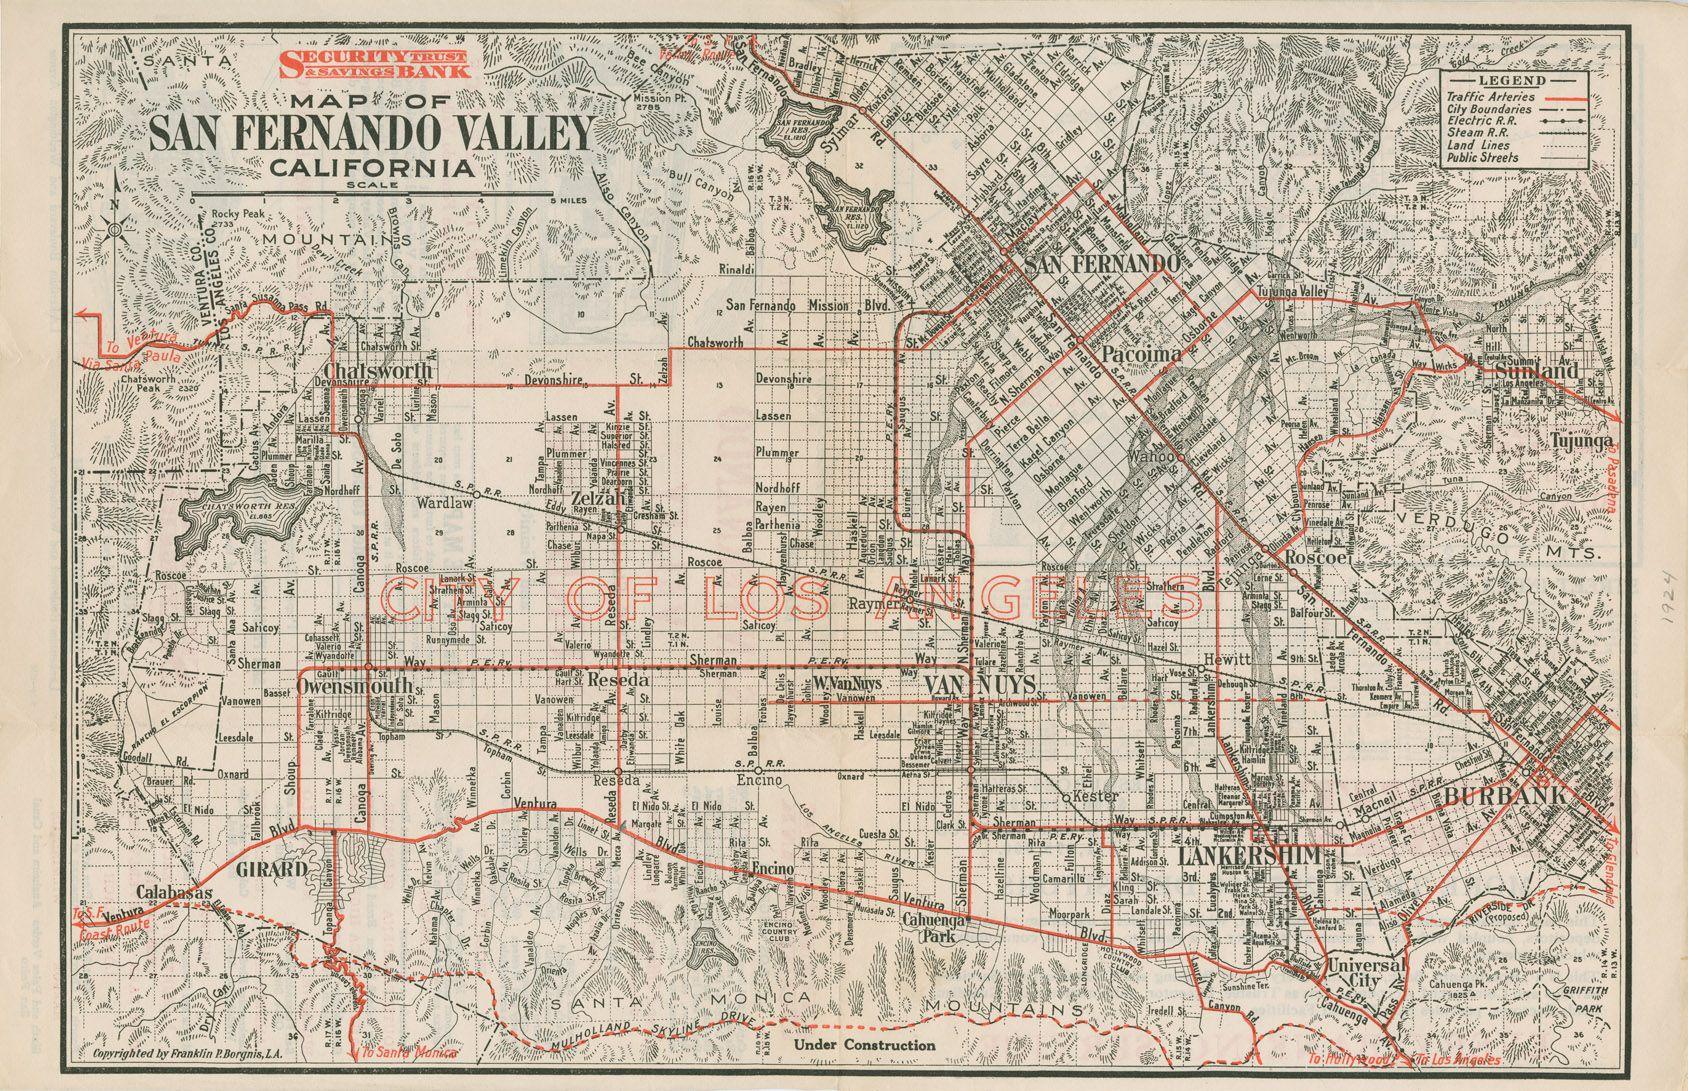 San Fernando Valley 1924 Los Angeles Map San Fernando Valley California History